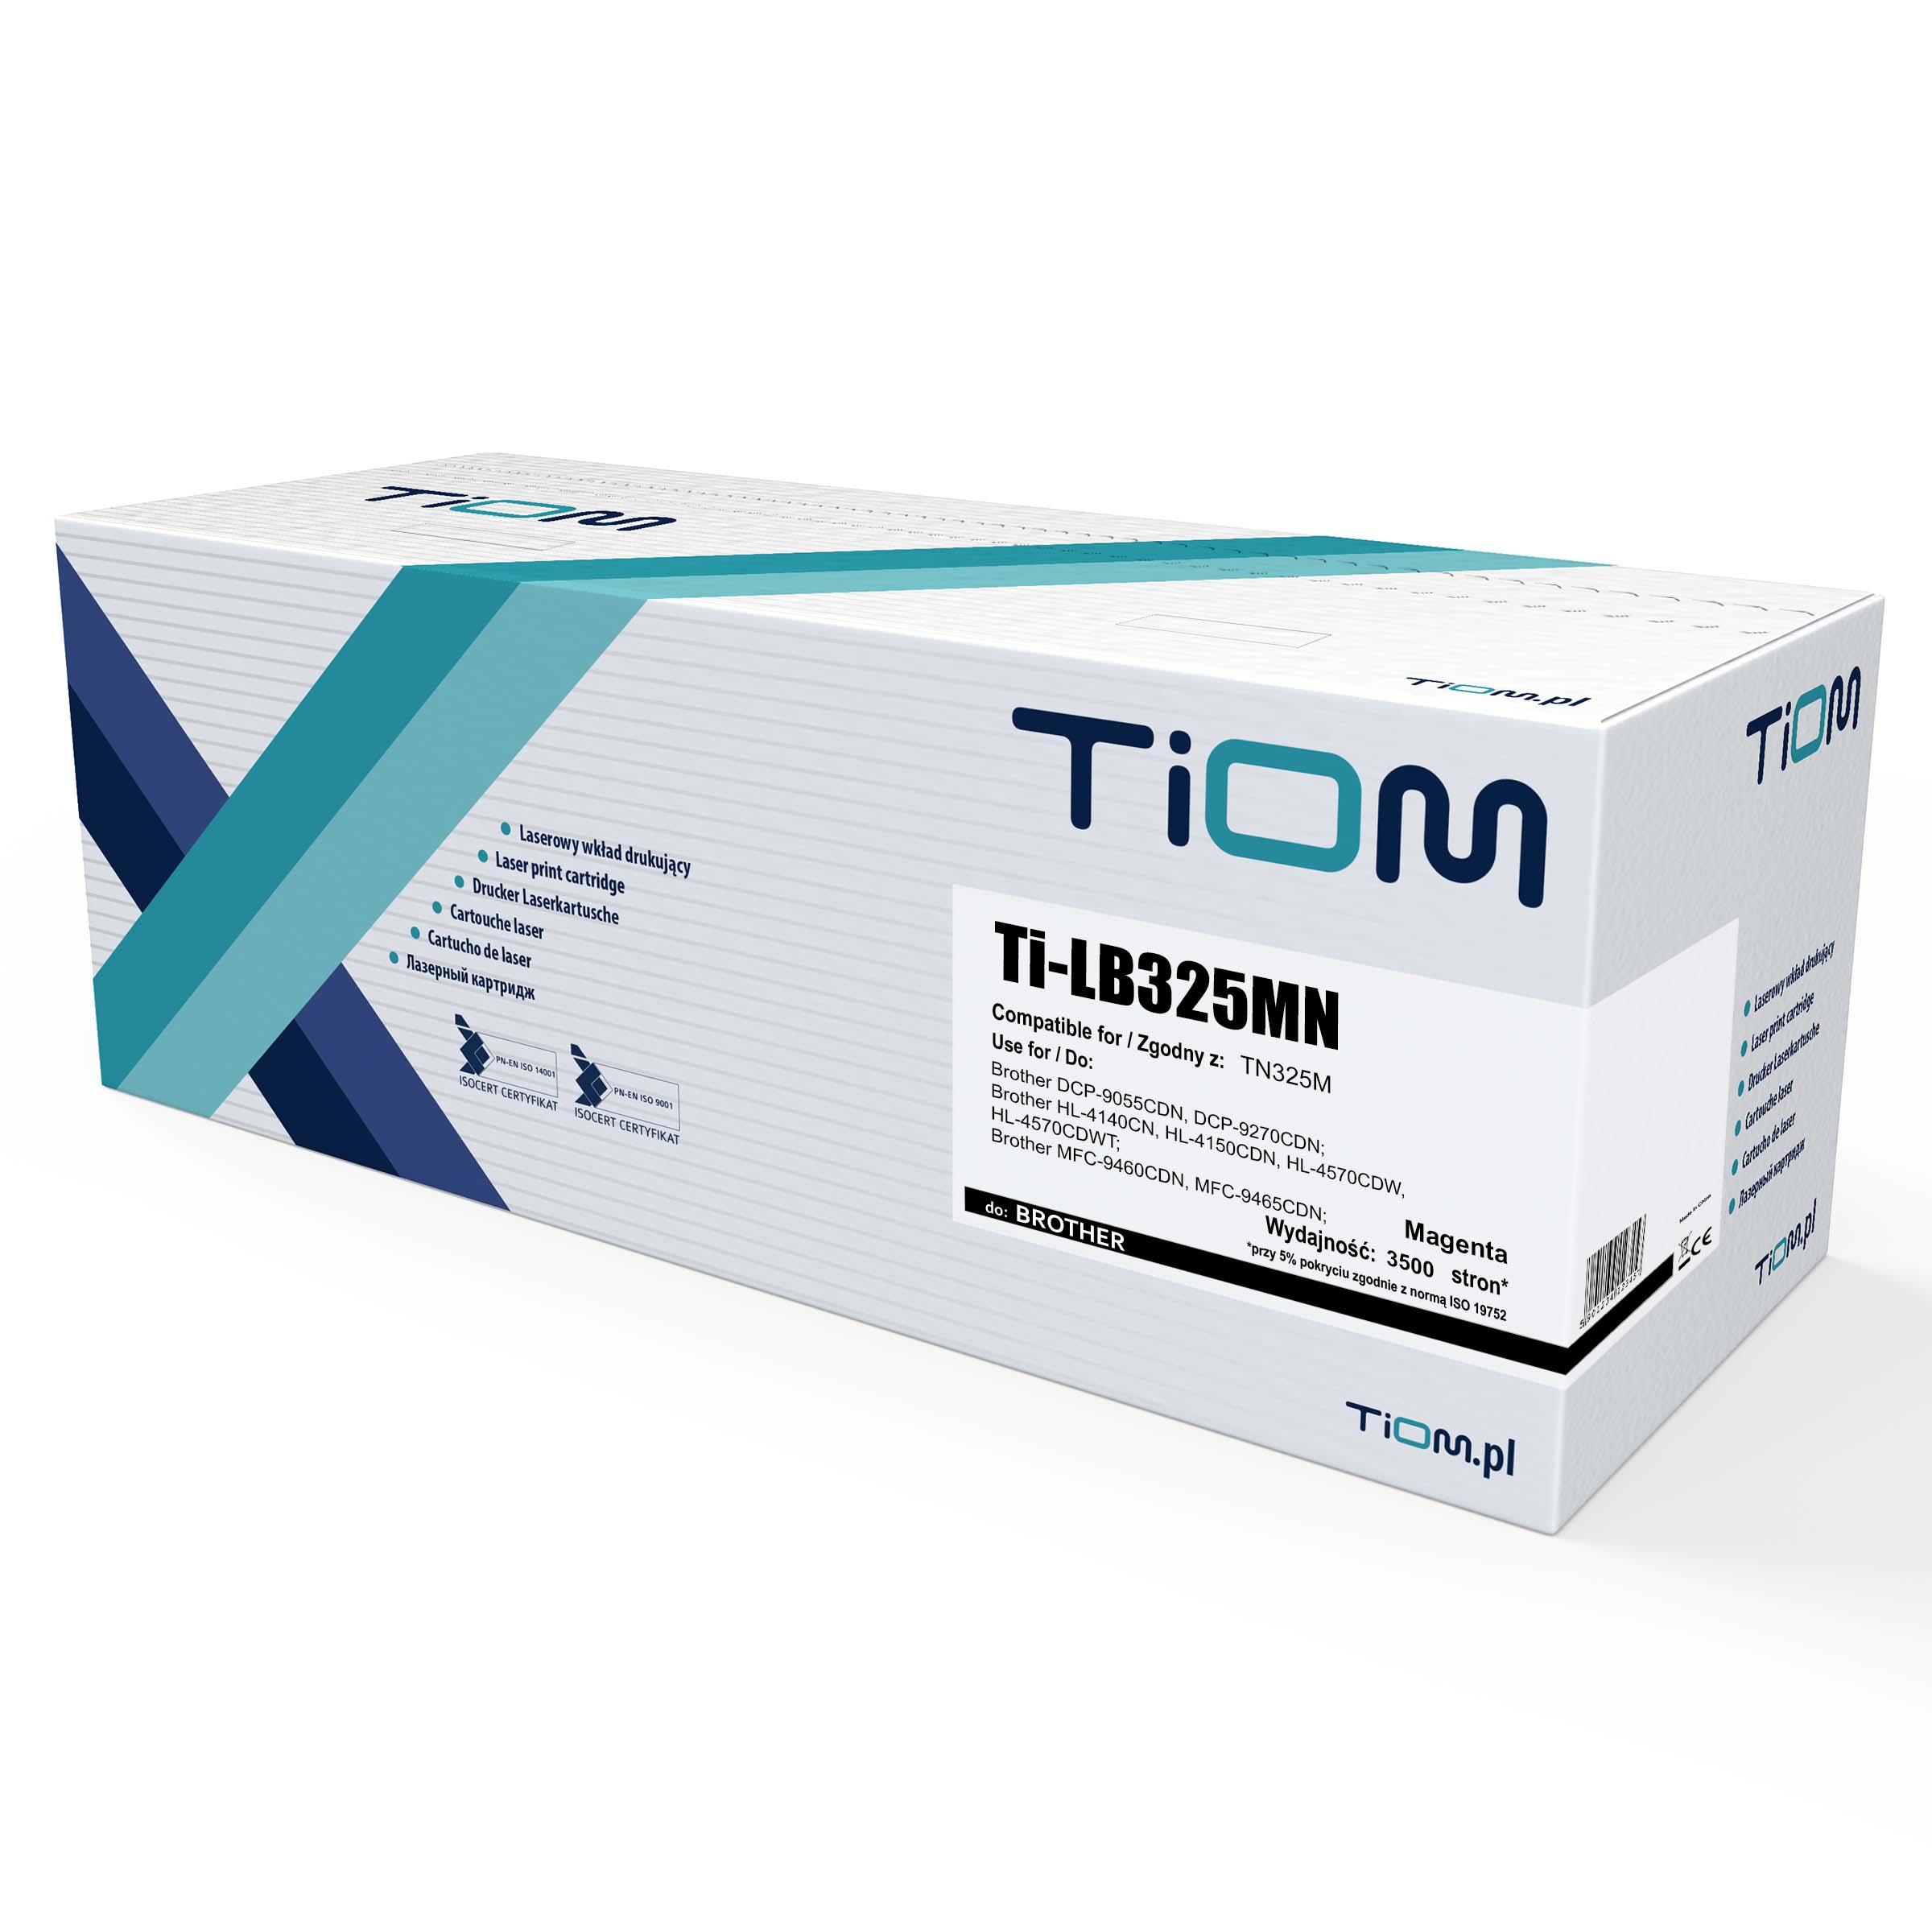 Ti-LB325MN Toner Tiom do Brother 325MN | TN325M | 3500 str. | magenta